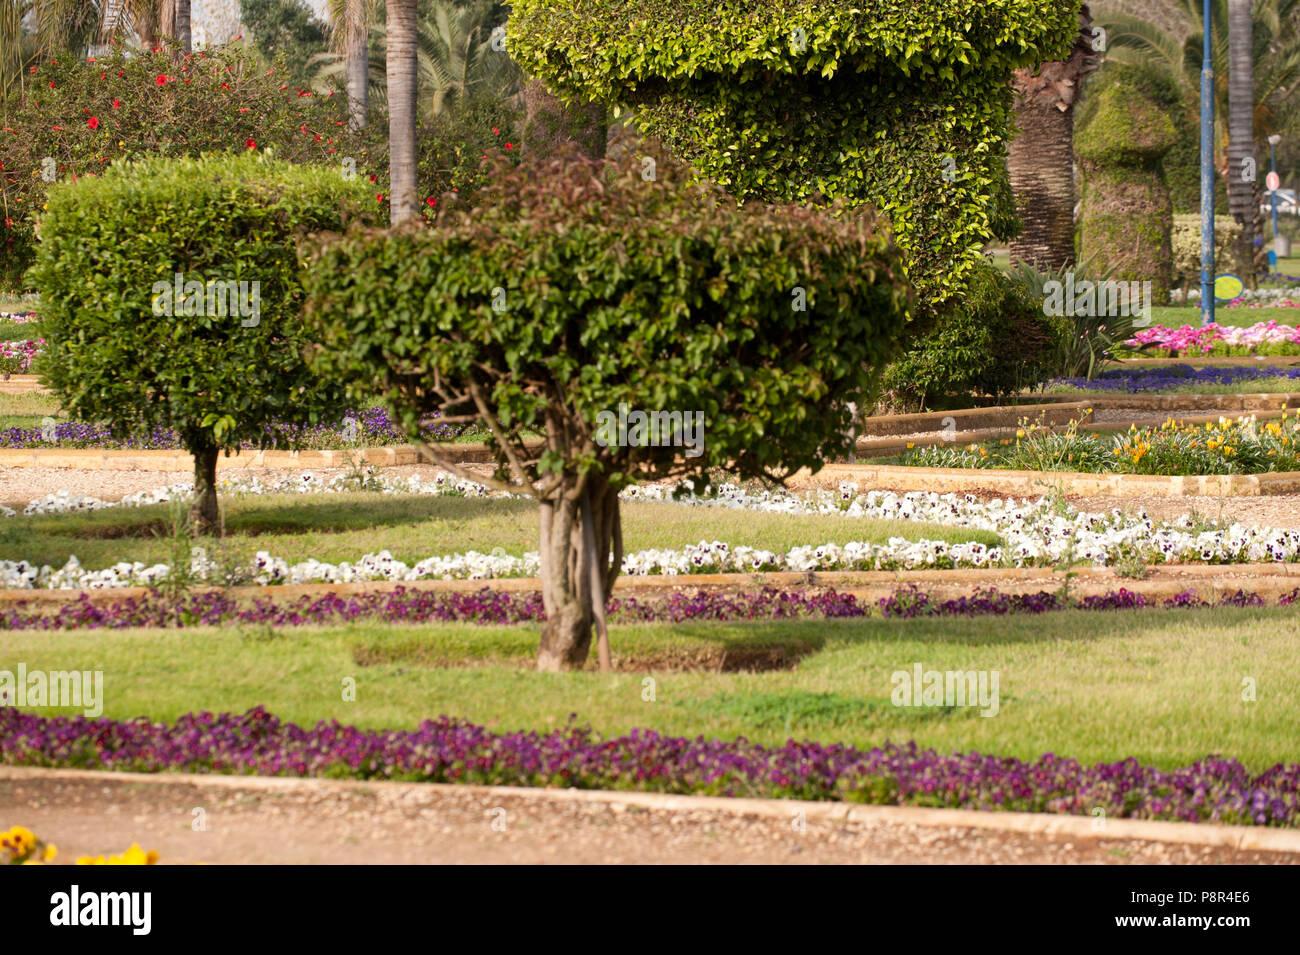 Beautiful garden with flowers ang trees stock photo 211950094 alamy beautiful garden with flowers ang trees izmirmasajfo